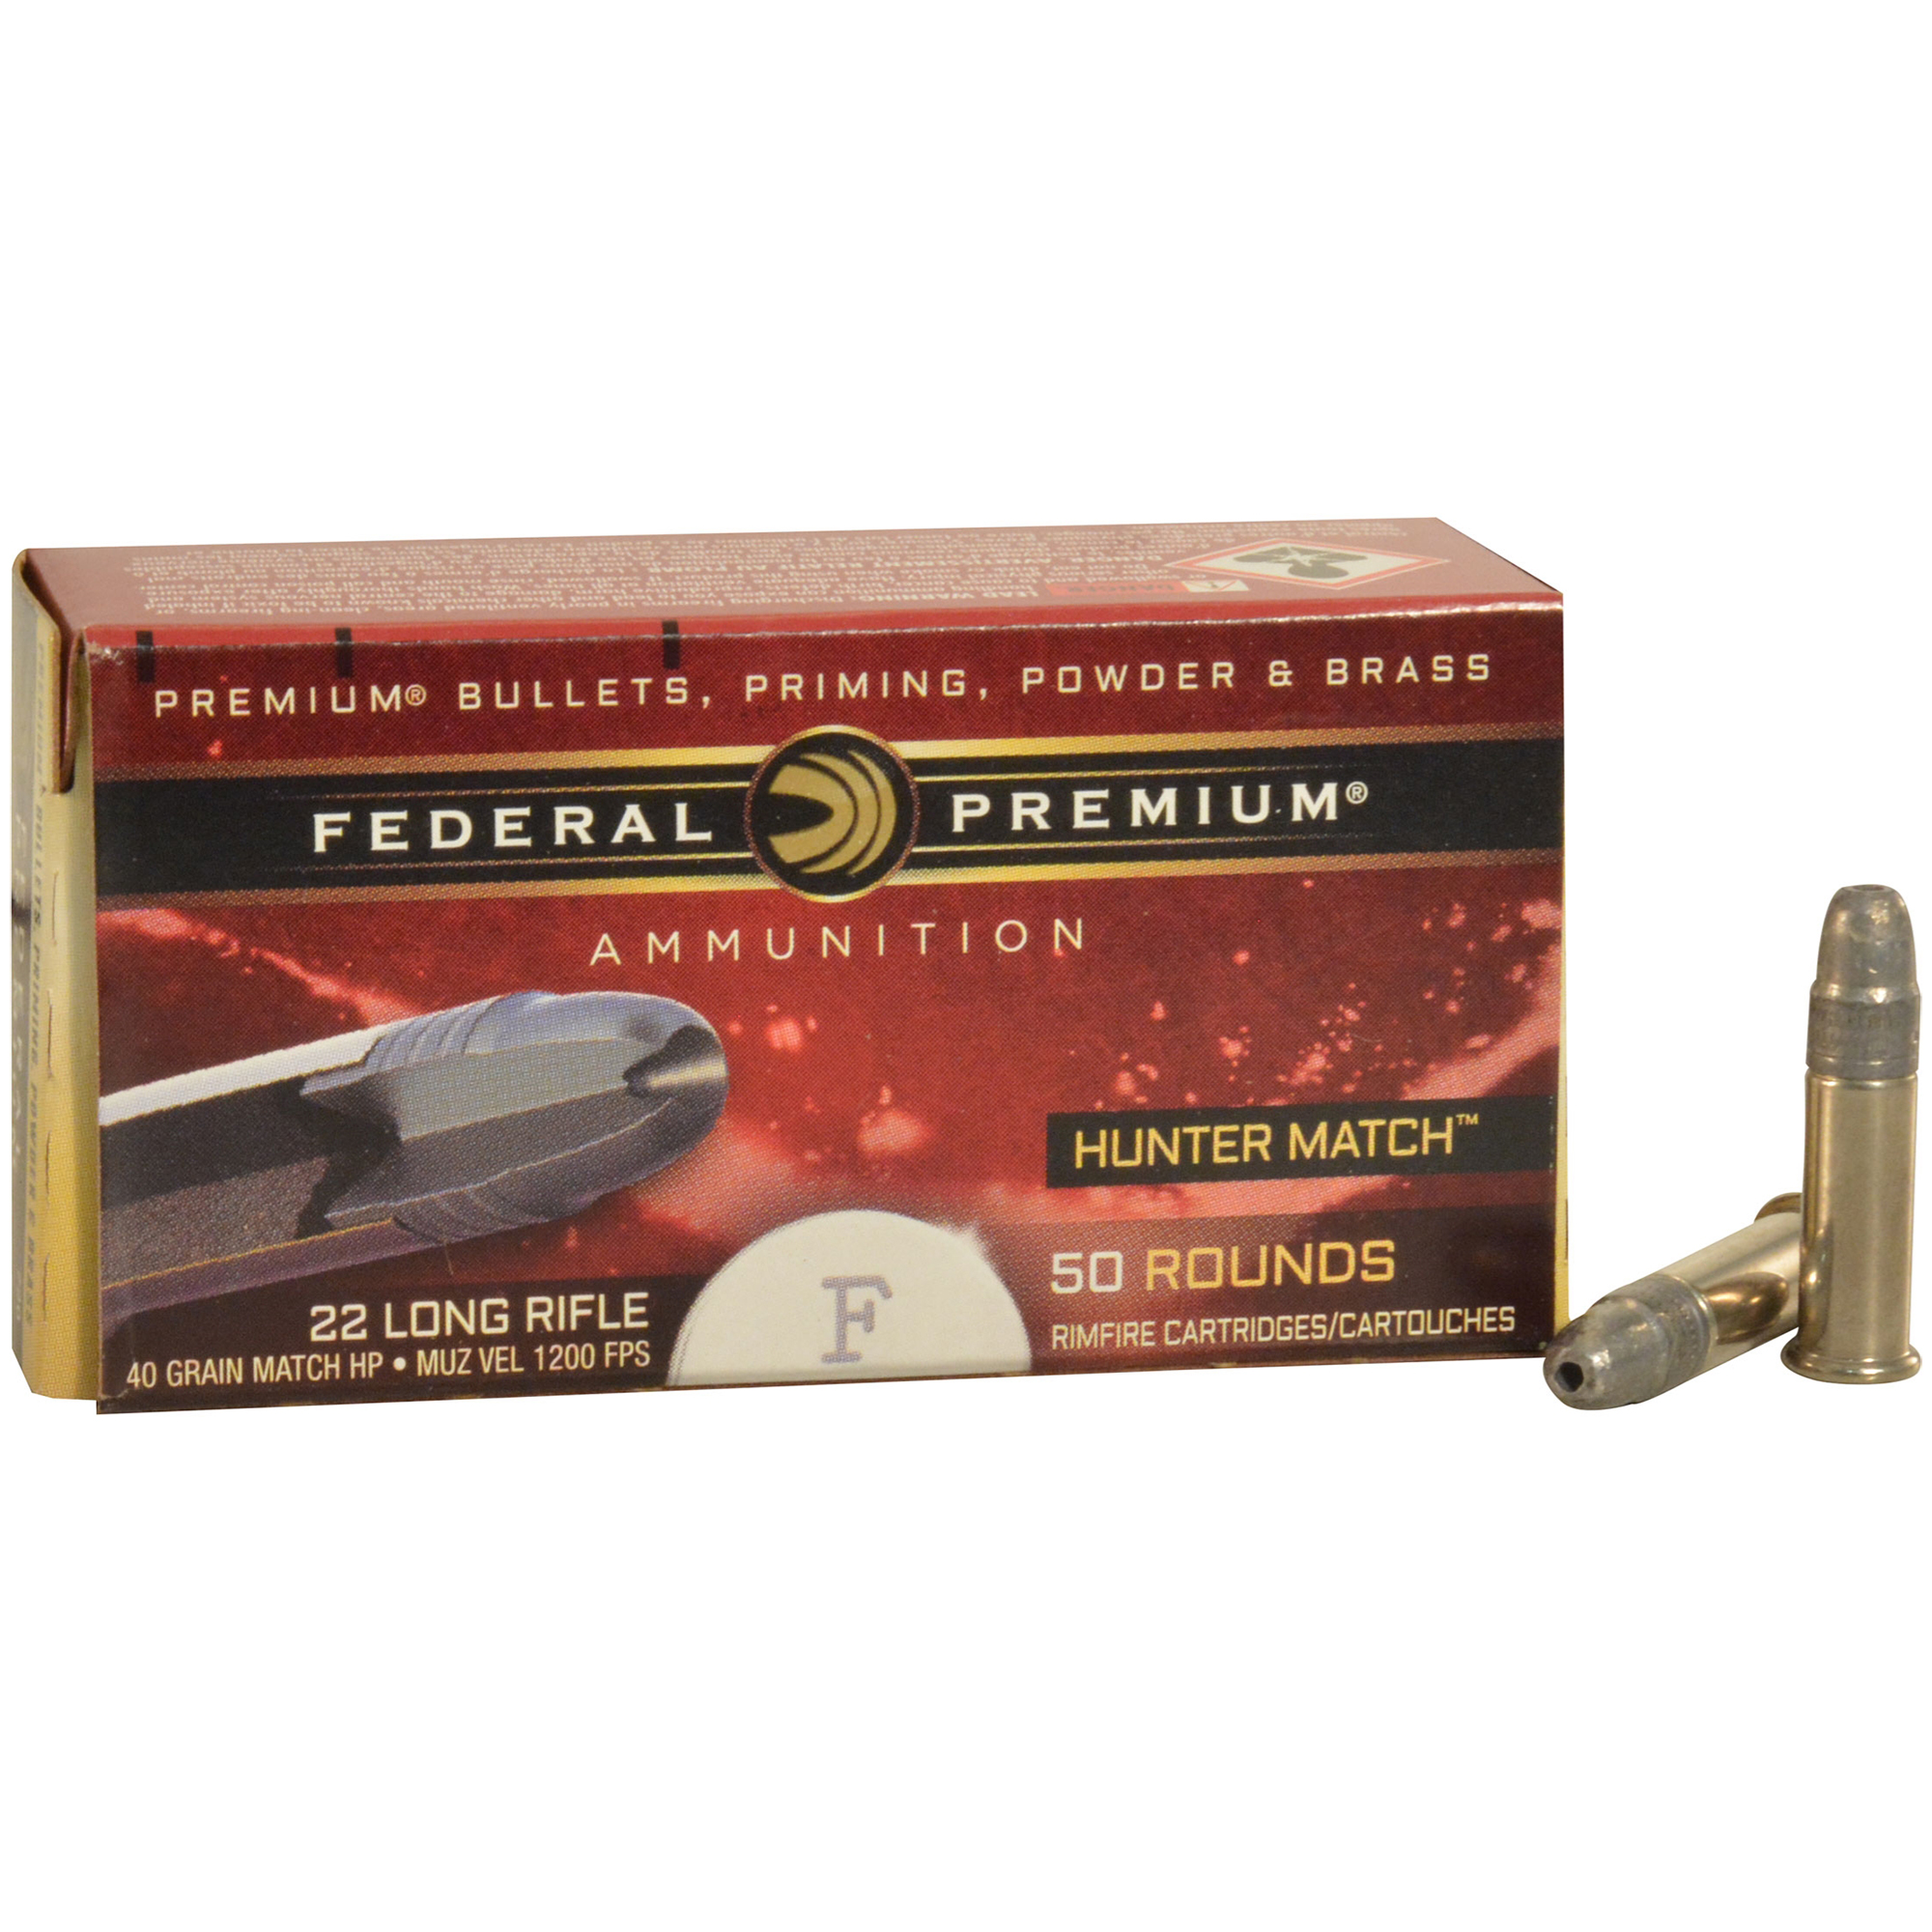 Federal Premium Hunter Match Rimfire Ammunition, .22 LR, 40-gr, HP